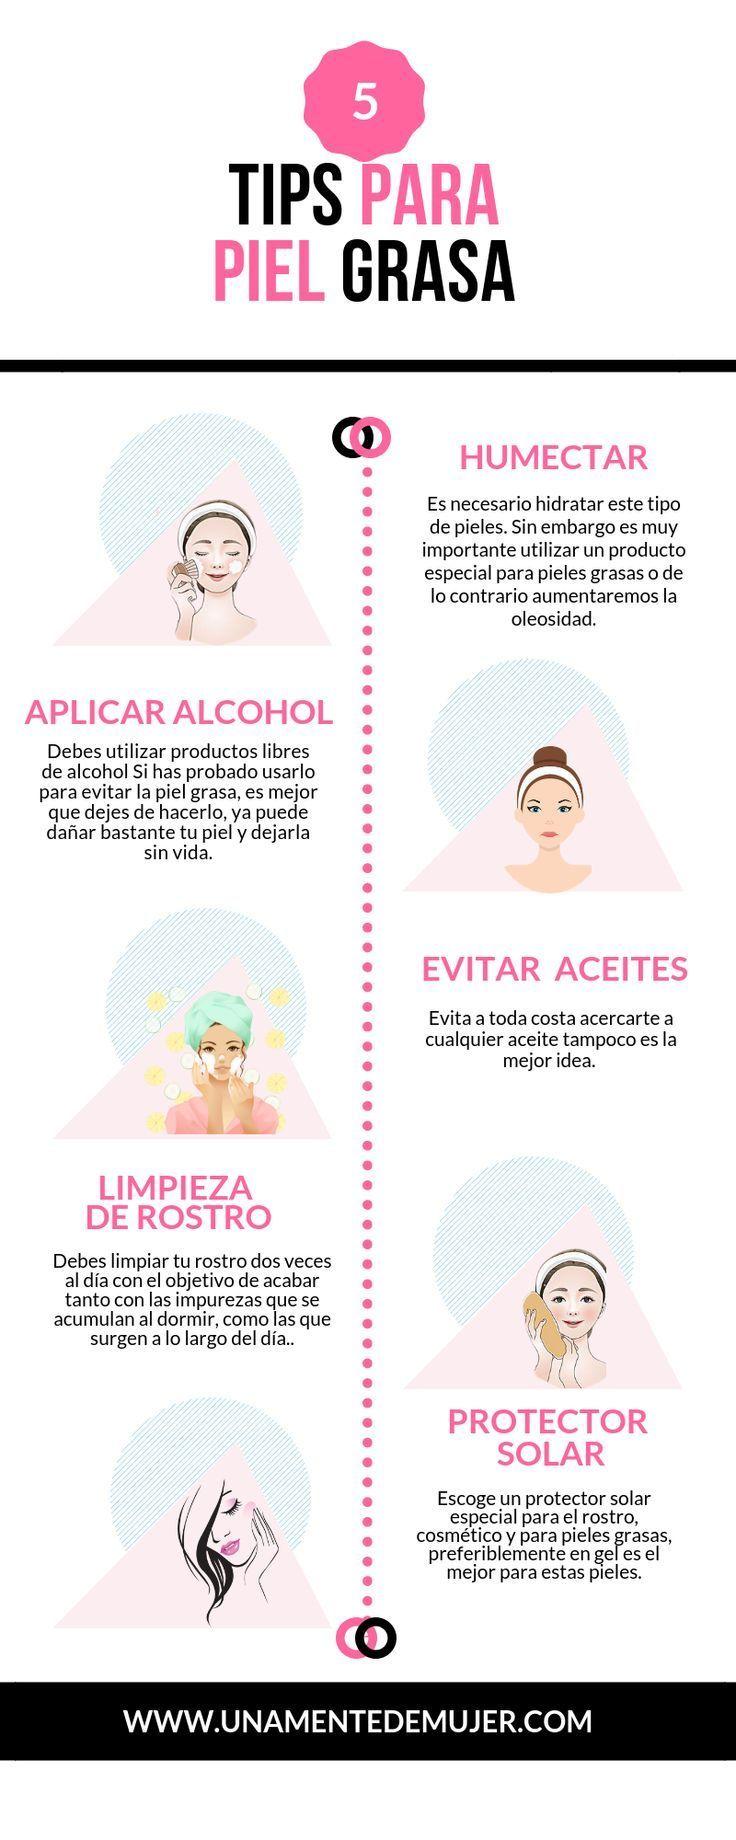 5 Tips Maquillaje Para La Piel Grasa Grasa La Maquillaje Oily Para Piel Tips Maquillaje Para Piel Grasa Piel Grasa Cuidados Para La Piel Grasa